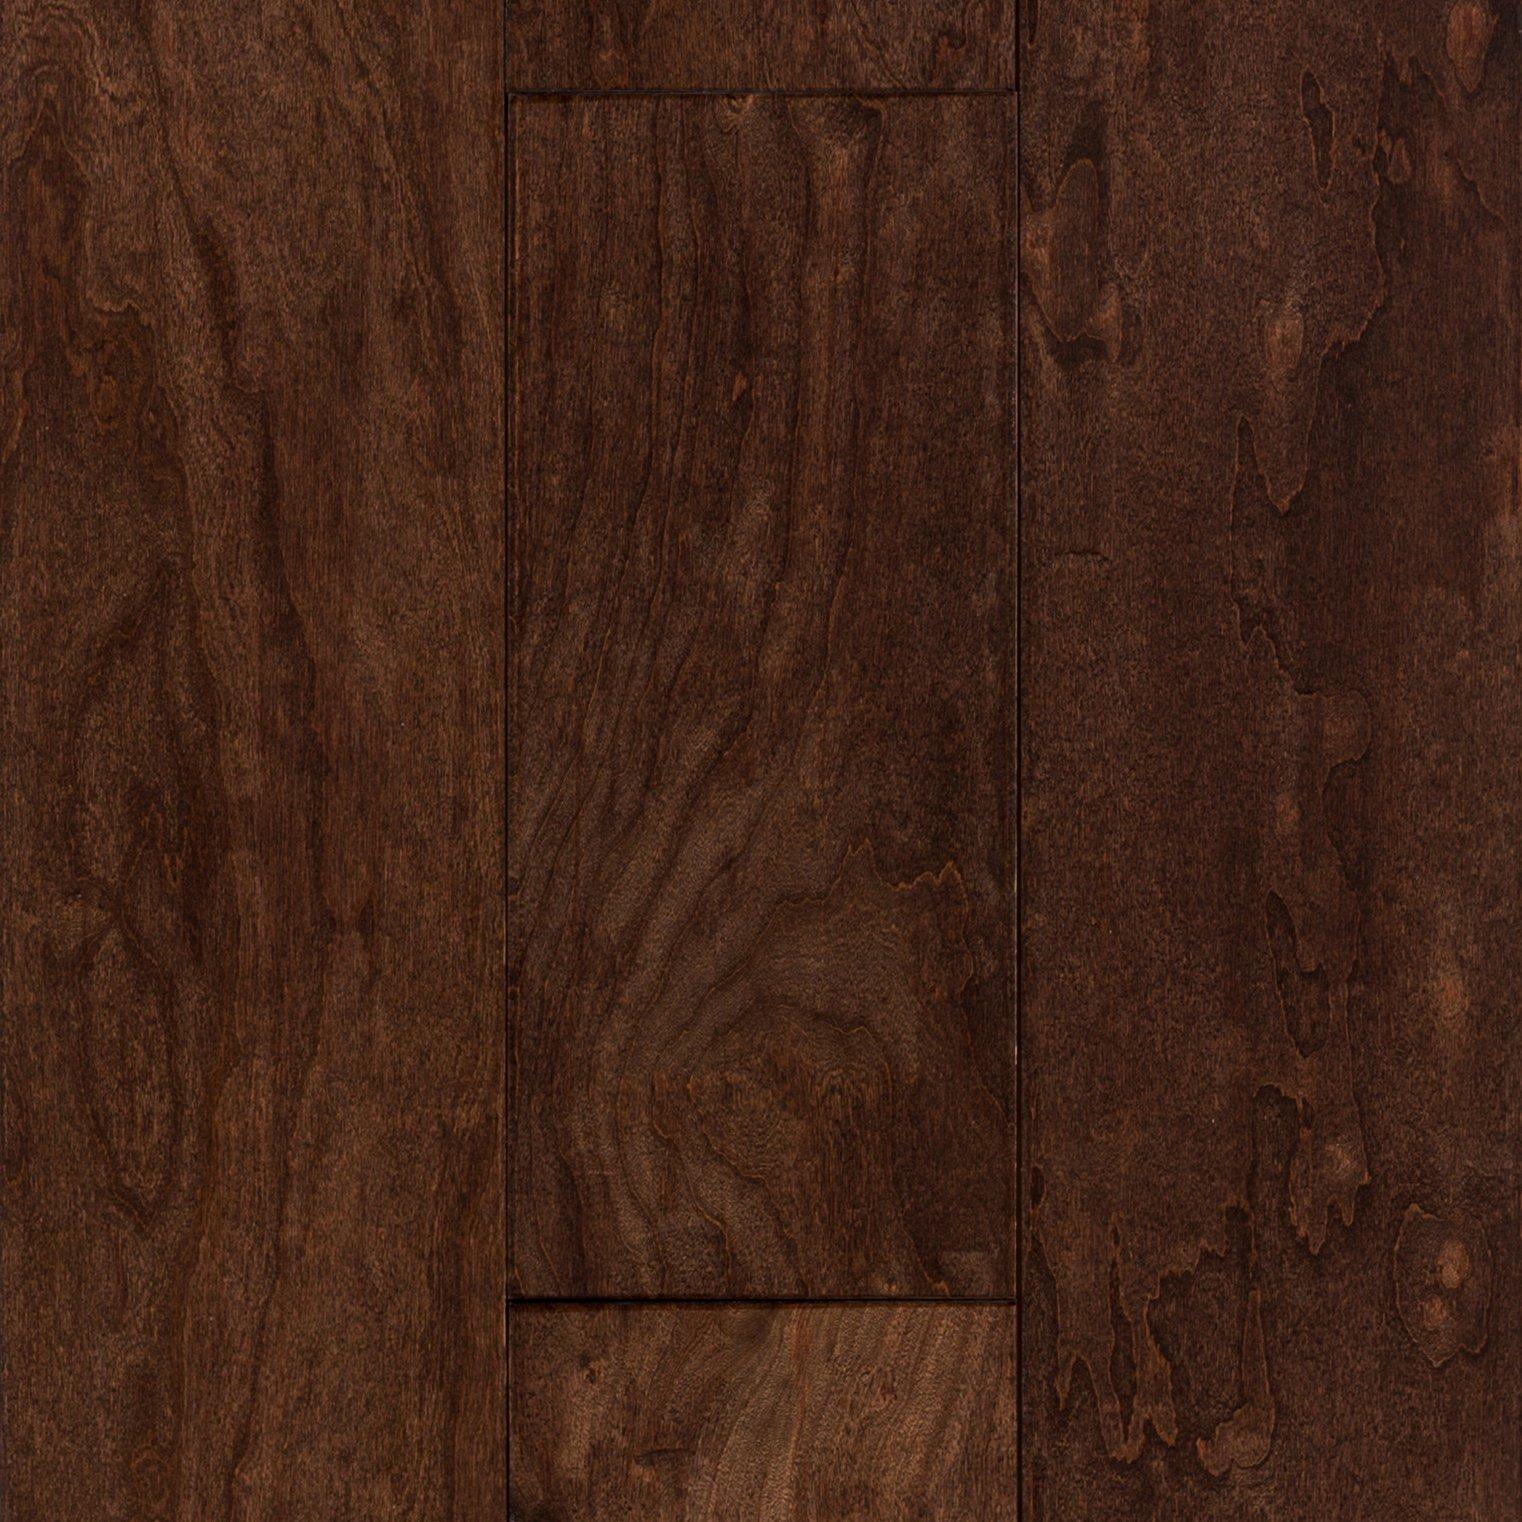 American Cherry Distressed Engineered Hardwood